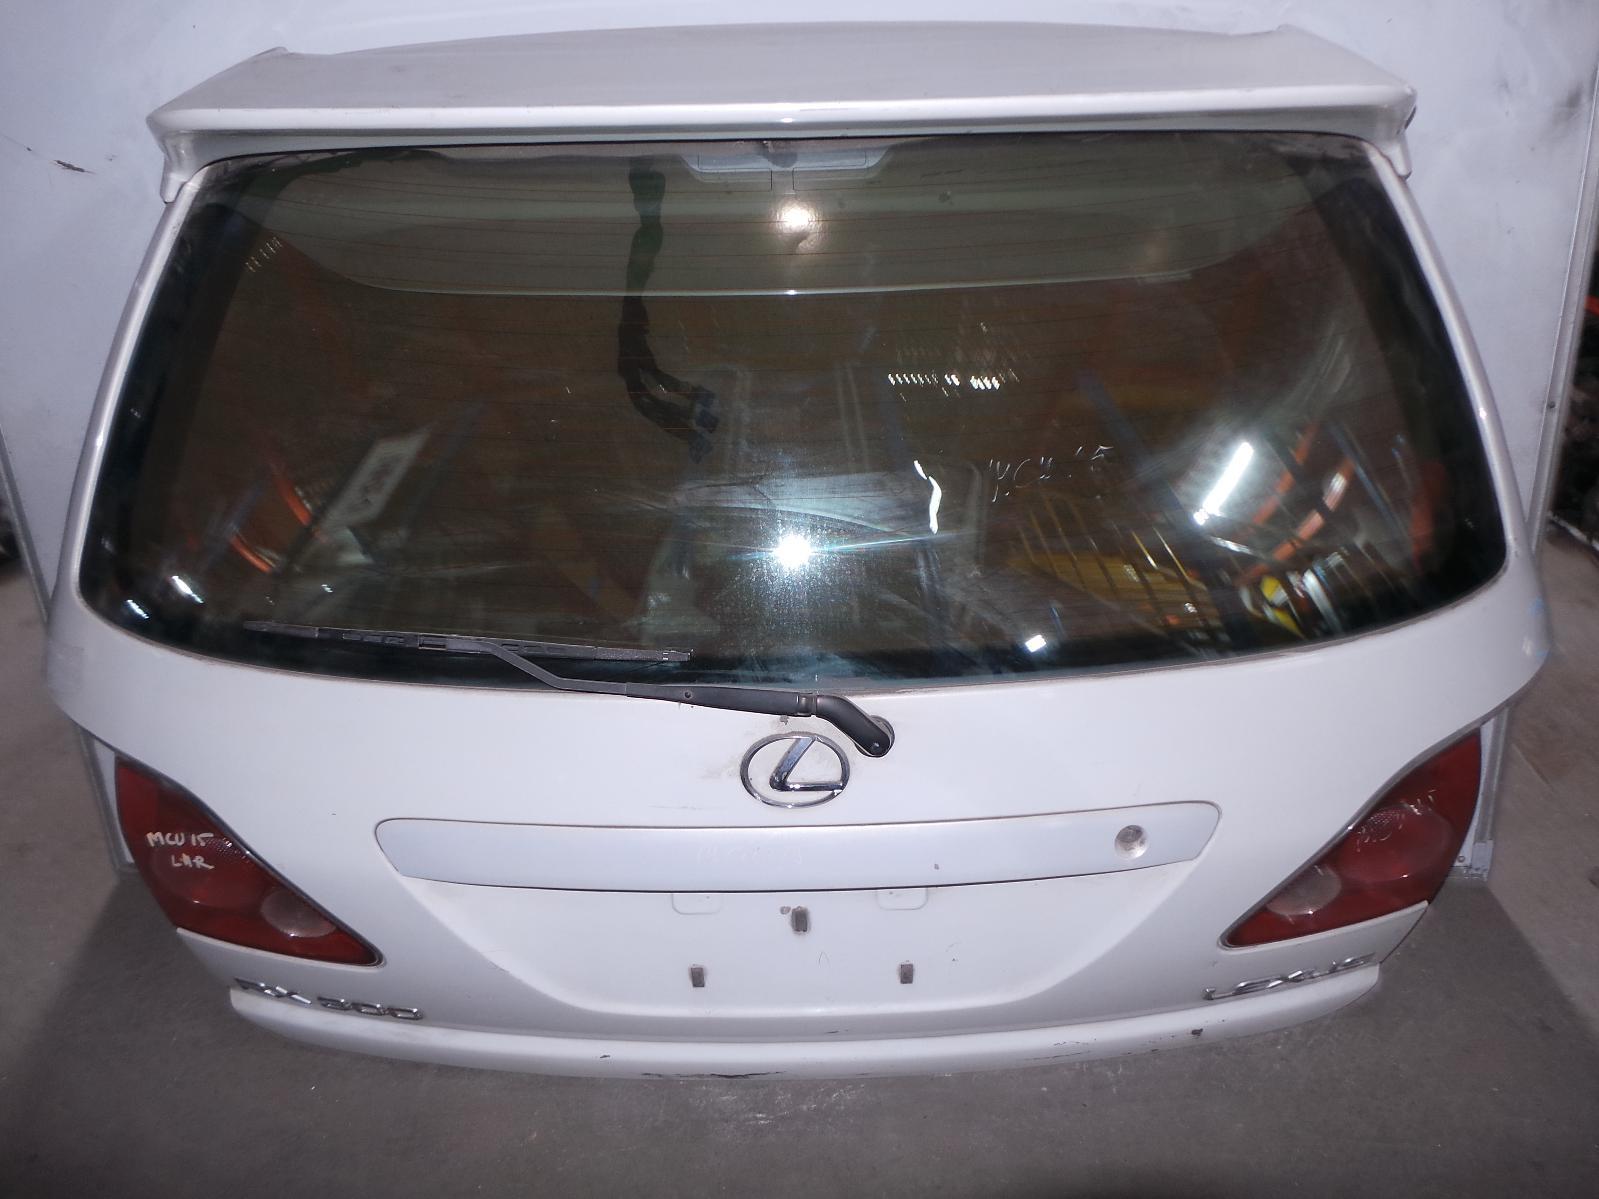 LEXUS RX300, Bootlid/Tailgate, HARRIER IMPORT 97-02